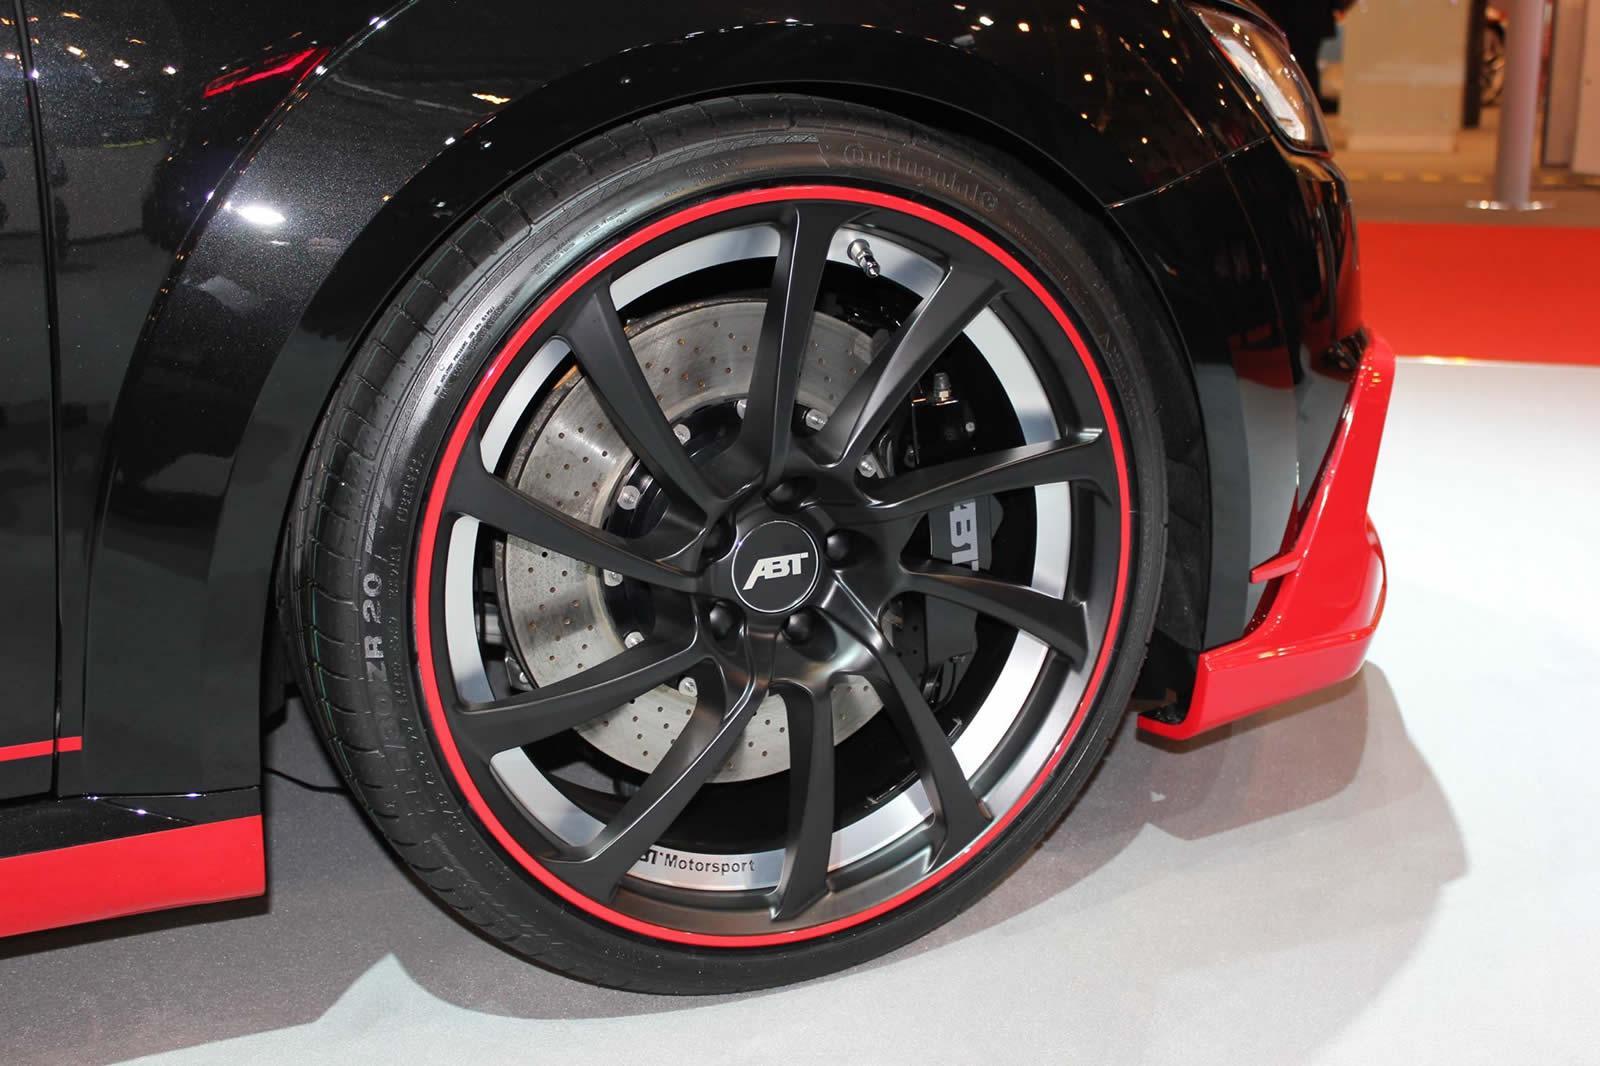 Audi Tt Coupe By Abt Sportline Inch Dr Wheels